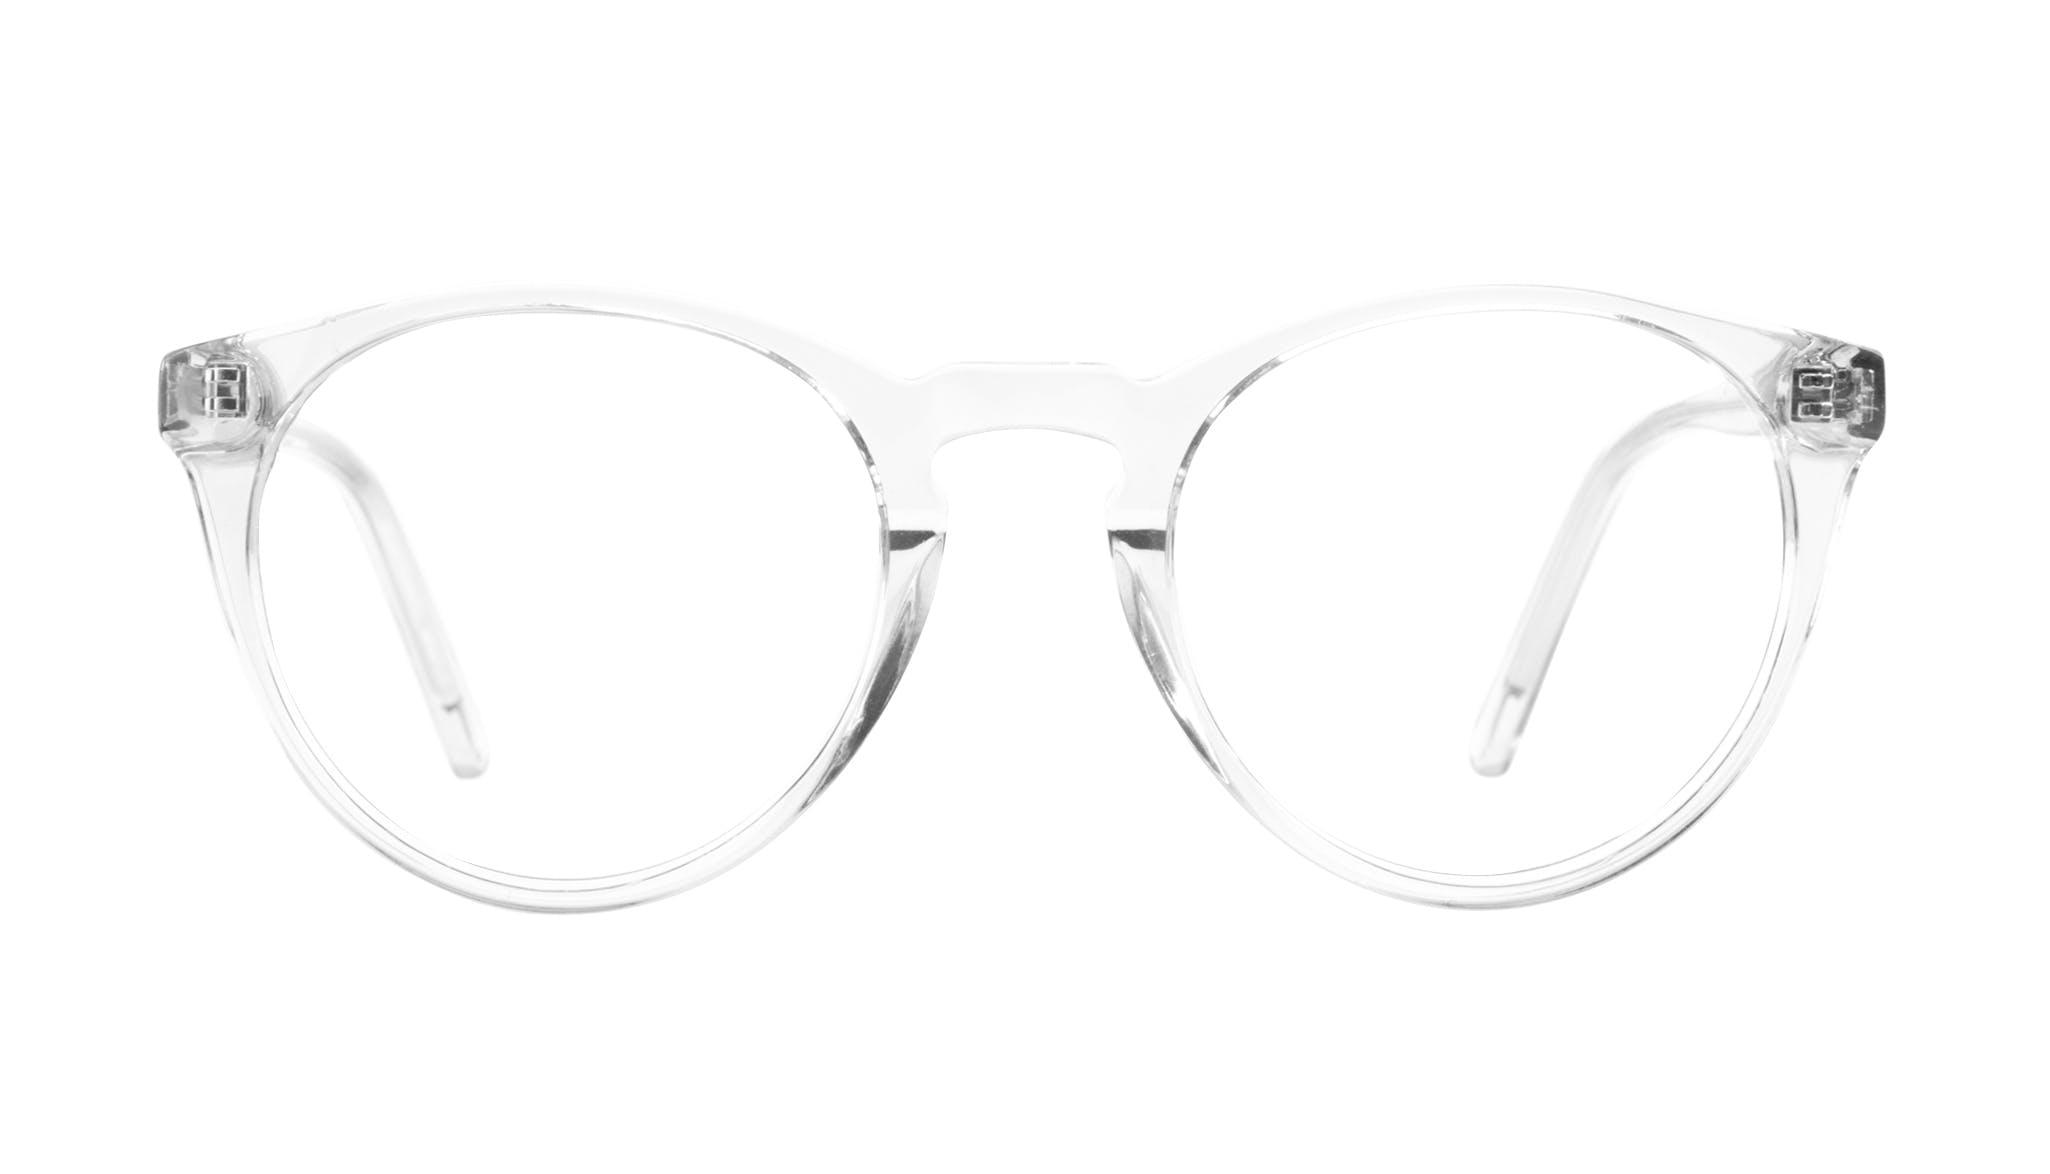 Affordable Fashion Glasses Round Eyeglasses Men Arch Grey